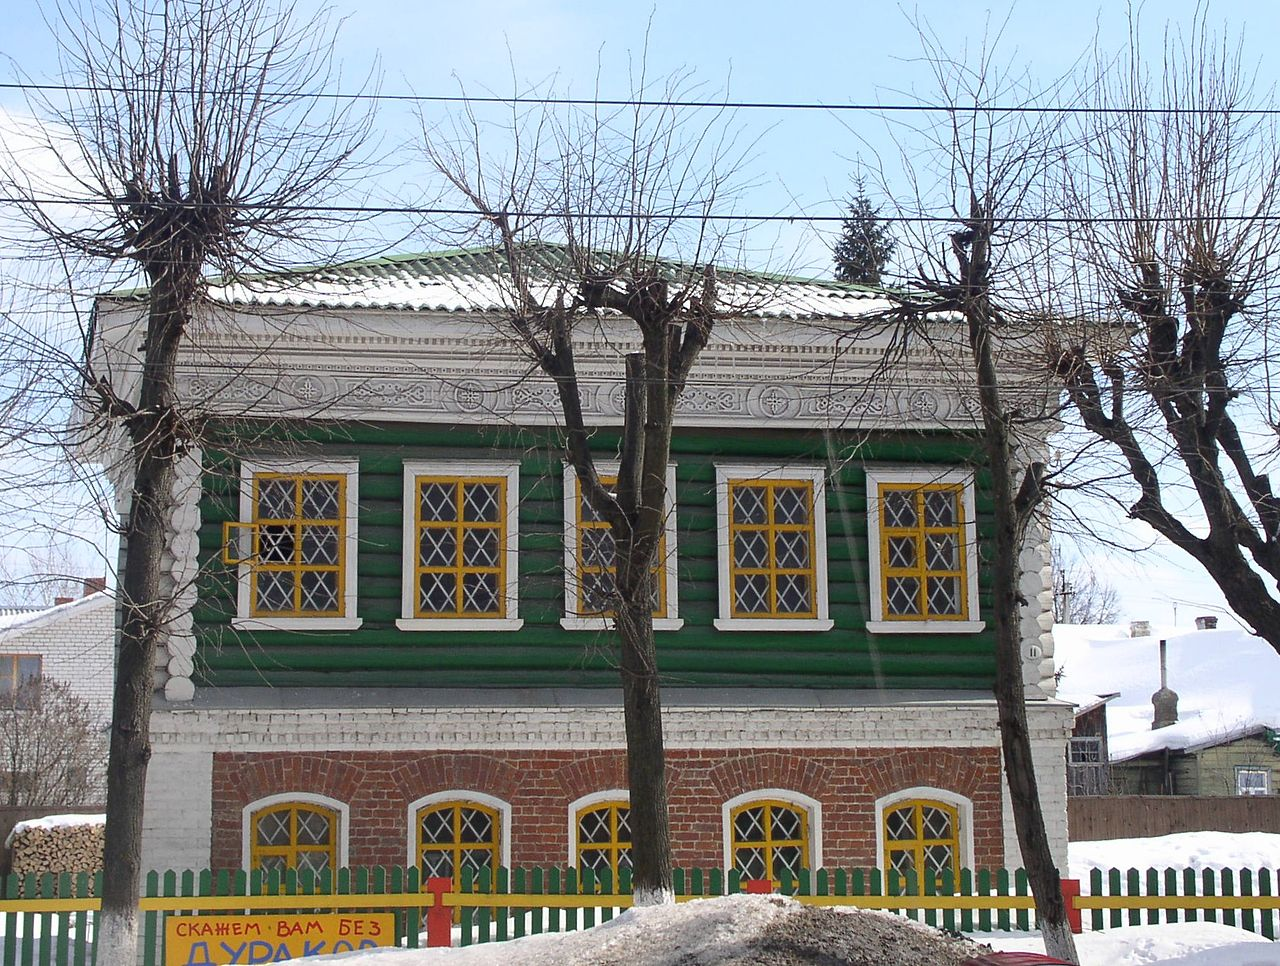 Музей утюга в Переславле-Залесском, фасад